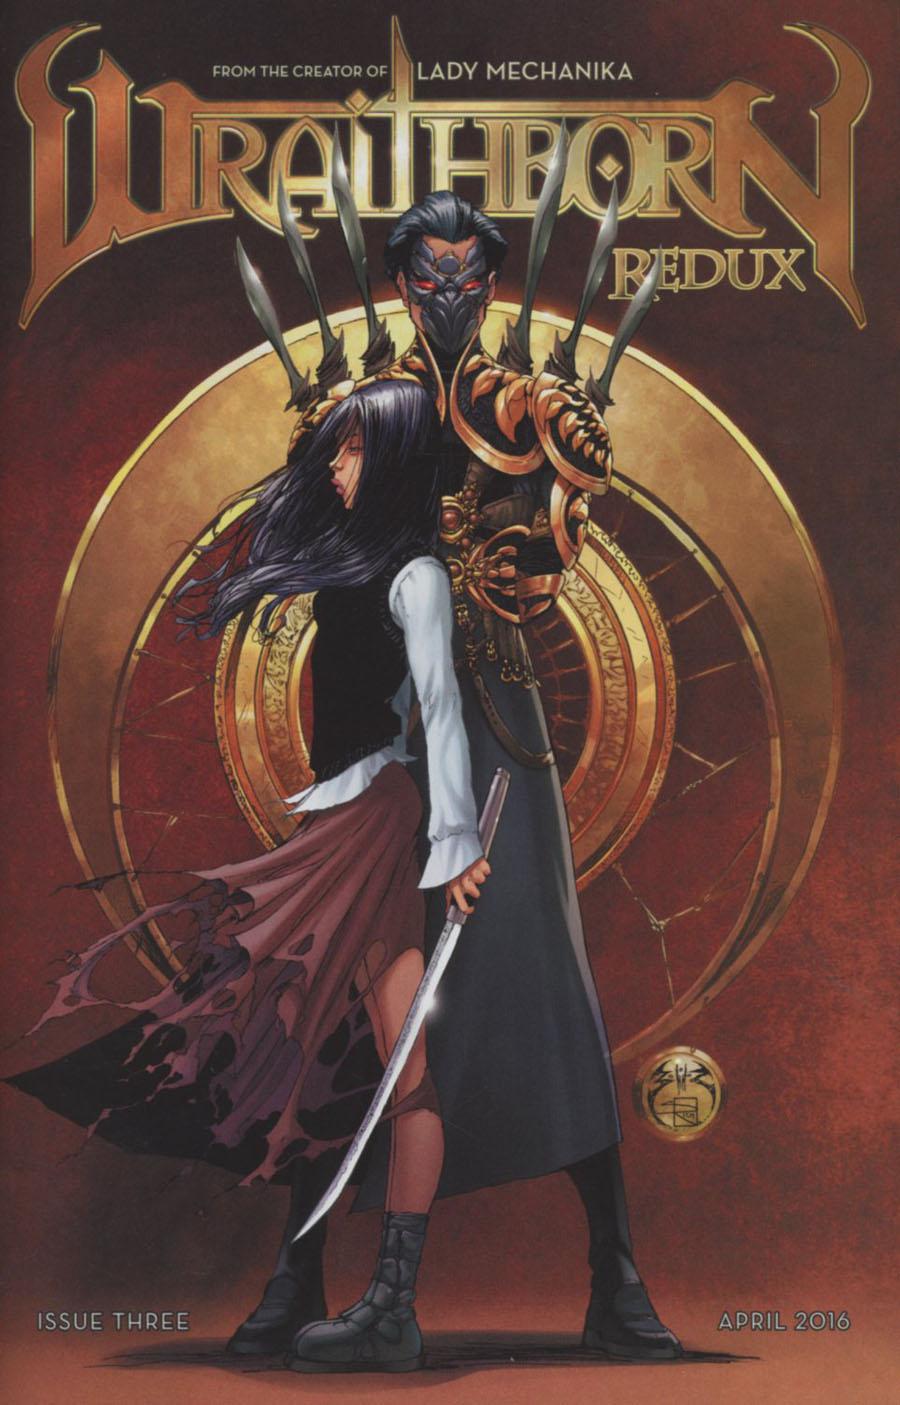 Wraithborn Redux #3 Cover A Regular Joe Benitez & Sabine Rich Cover